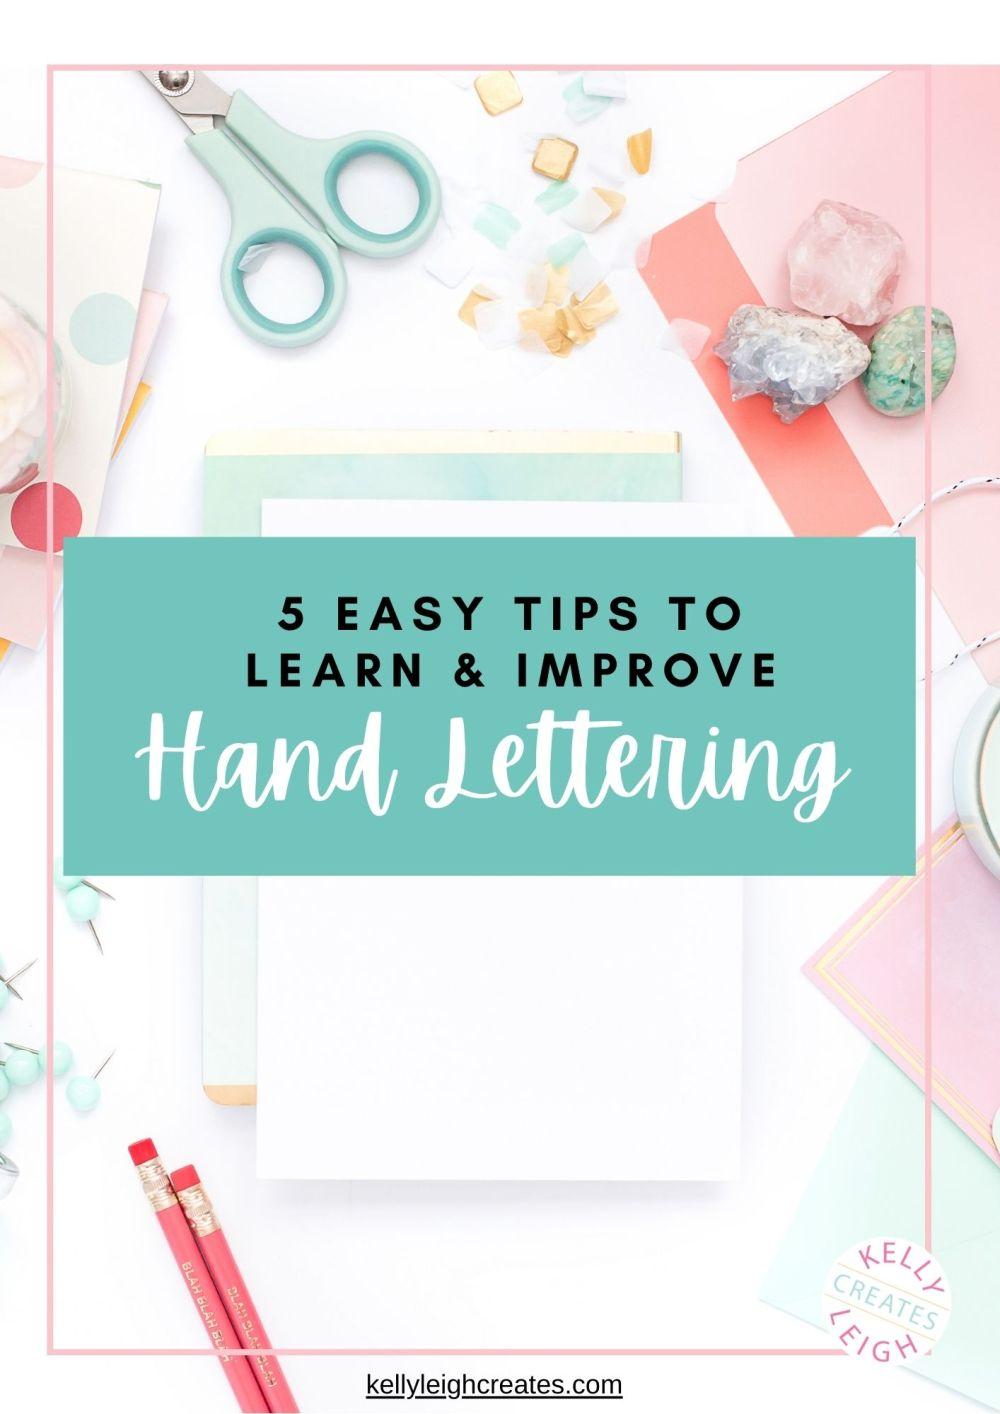 5 Easy Tips to Improve Hand Lettering via @printablecrush